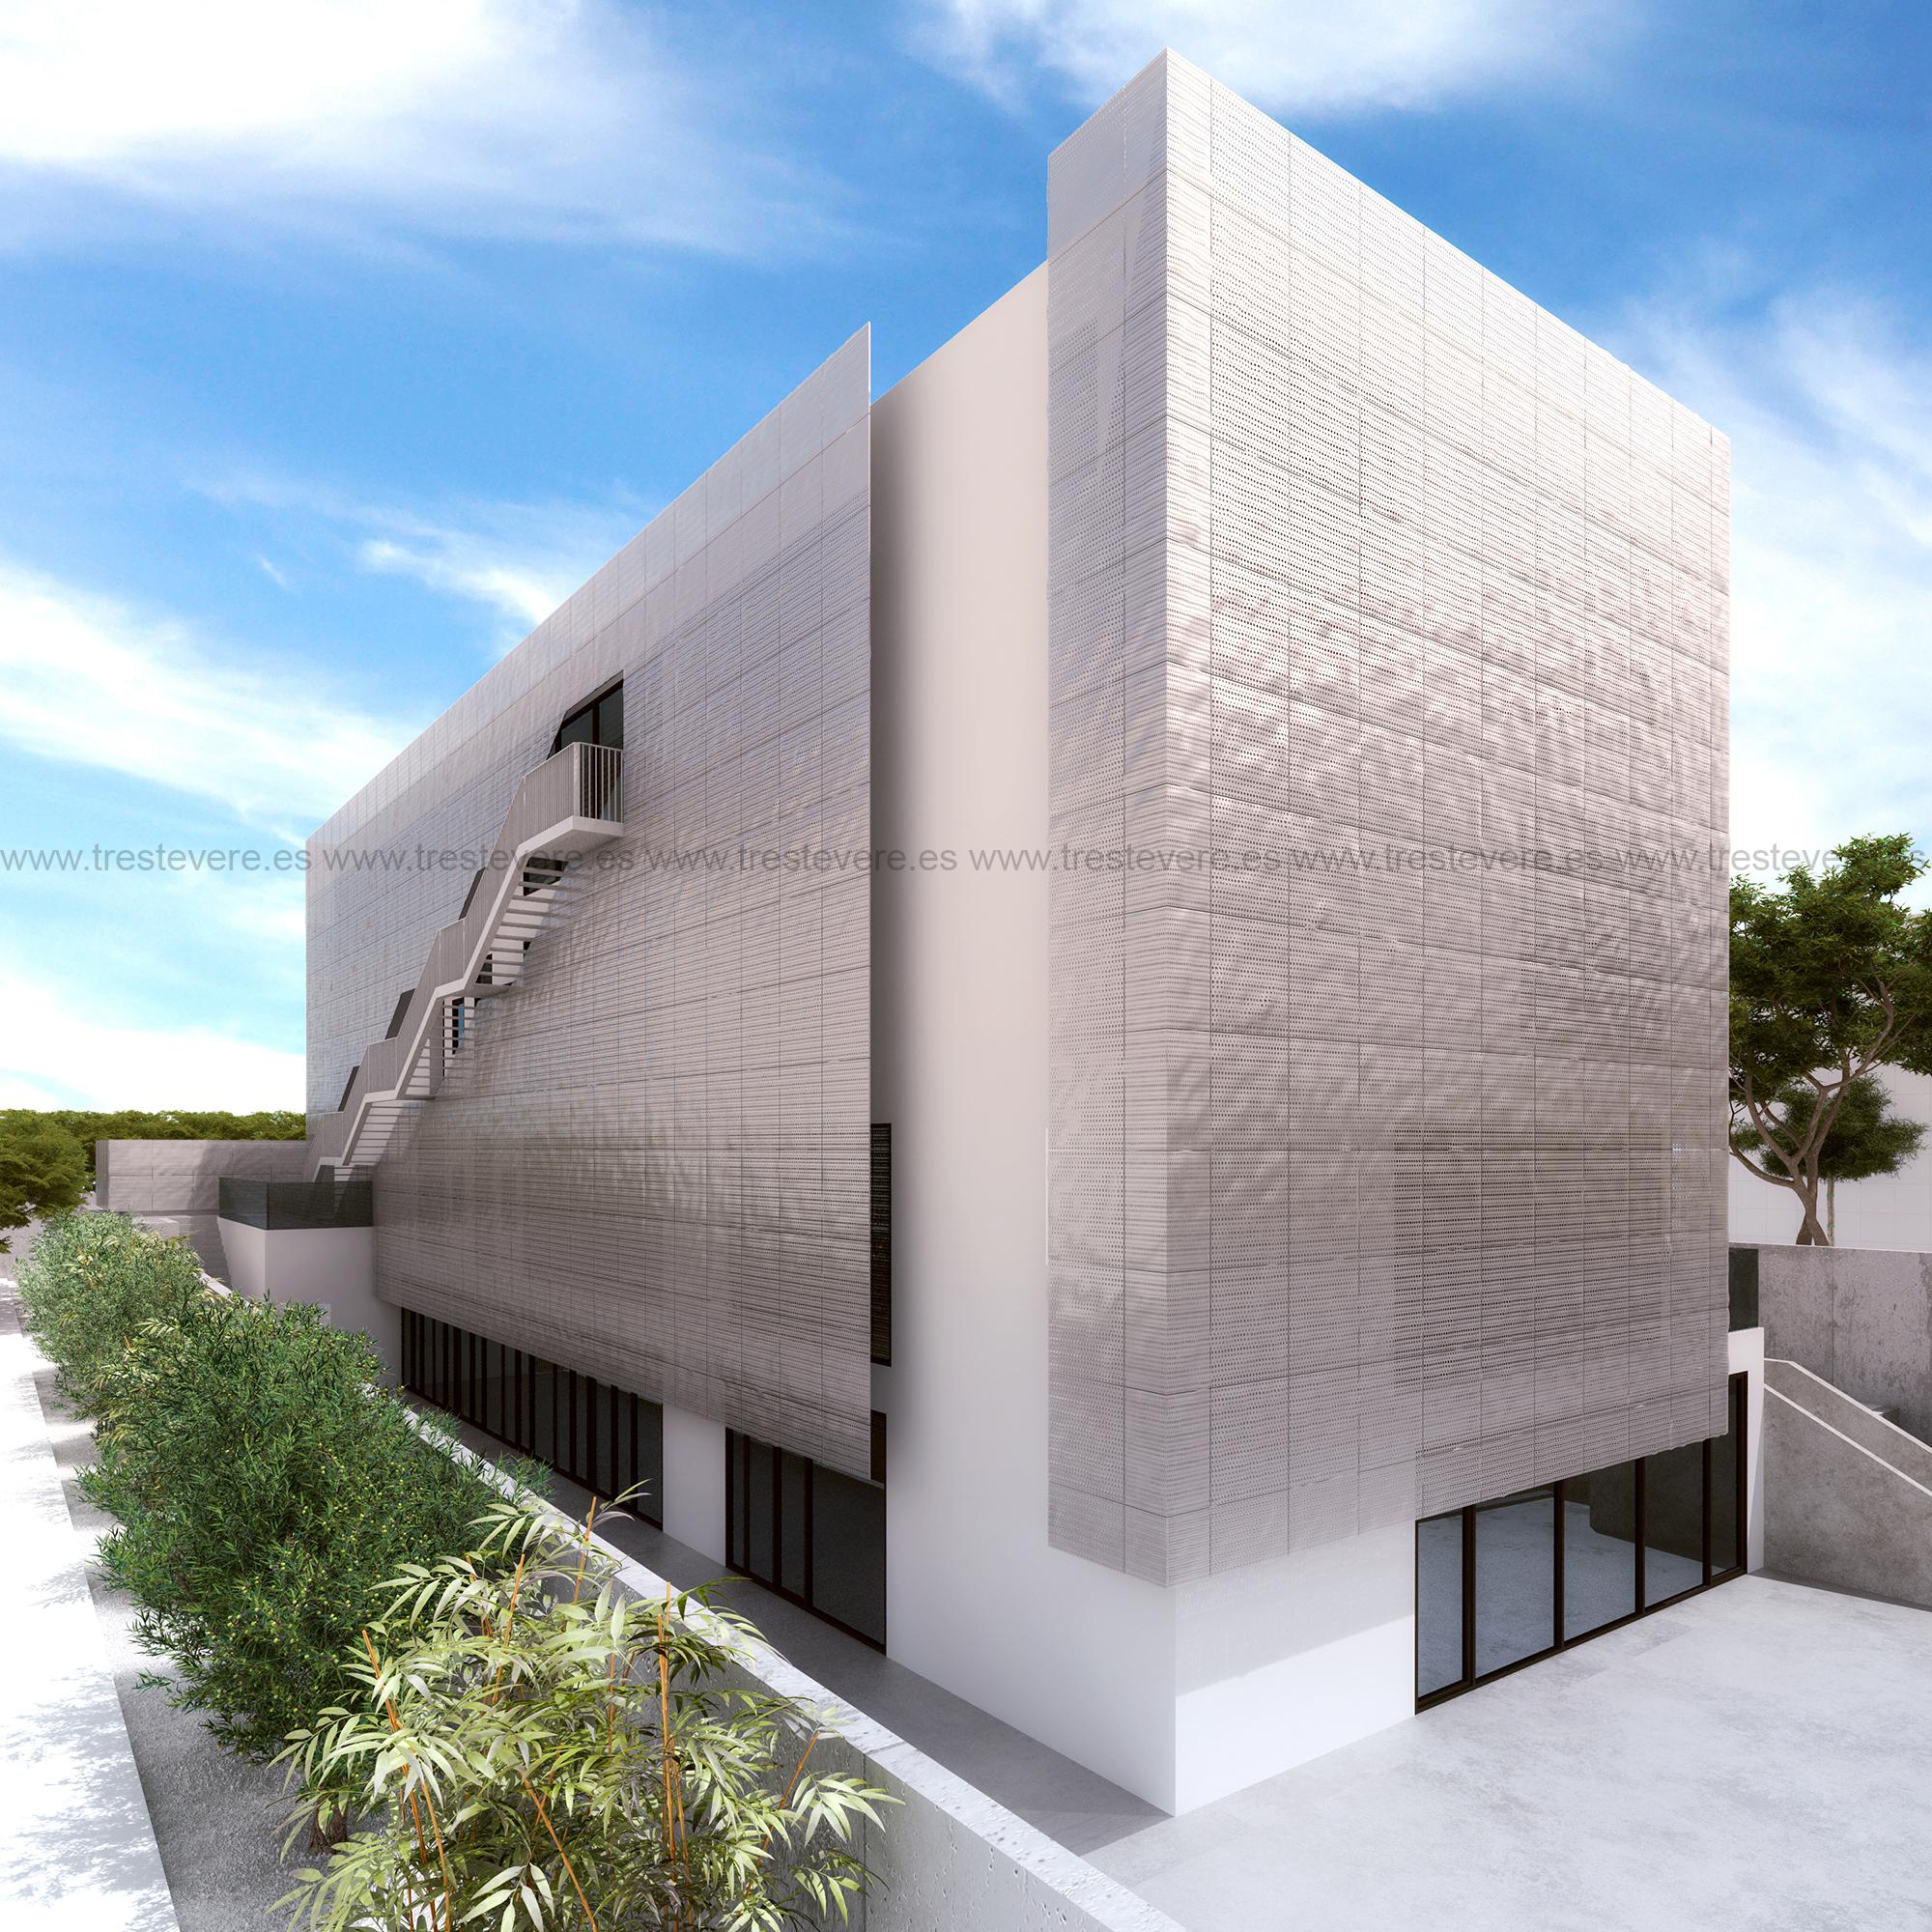 arquitectura biblioteca 3D 02